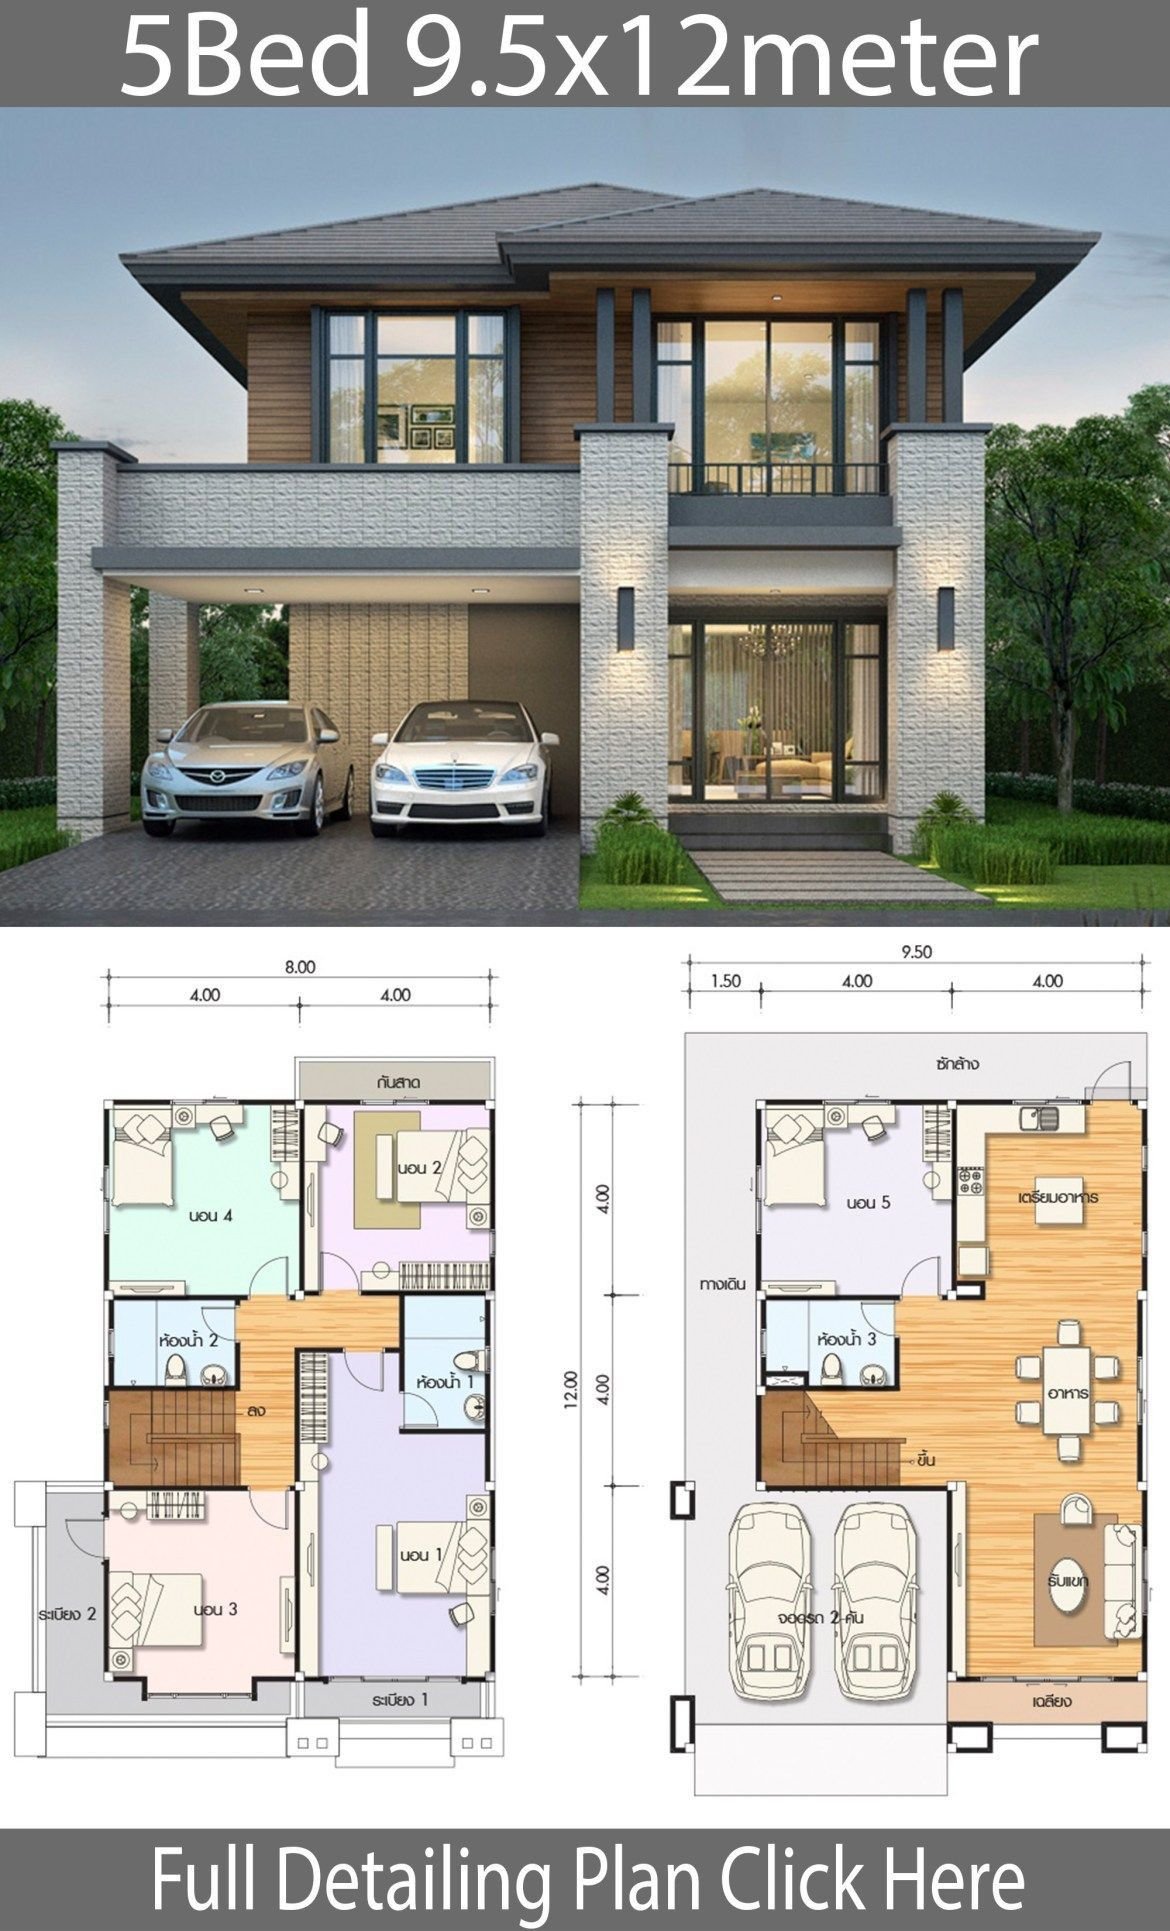 5 Bedroom Modern House 2021 In 2020 Duplex House Design House Front Design Duplex House Plans